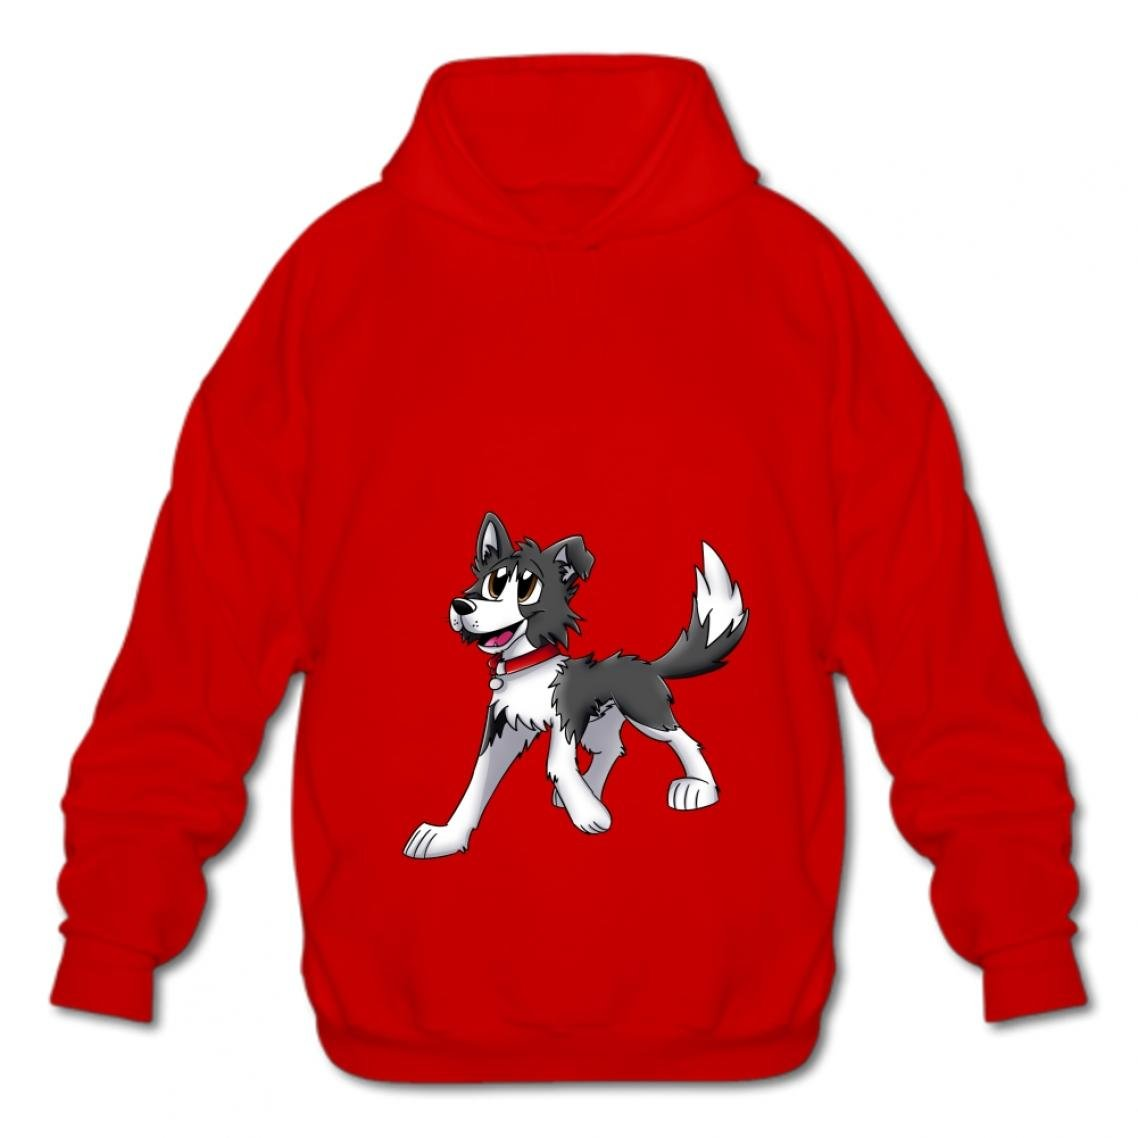 Tngjijish Hooded Sweatshirt Fashion Hoodies-03 Cartoon Dog Wsdc Style Cotton Pullover Men